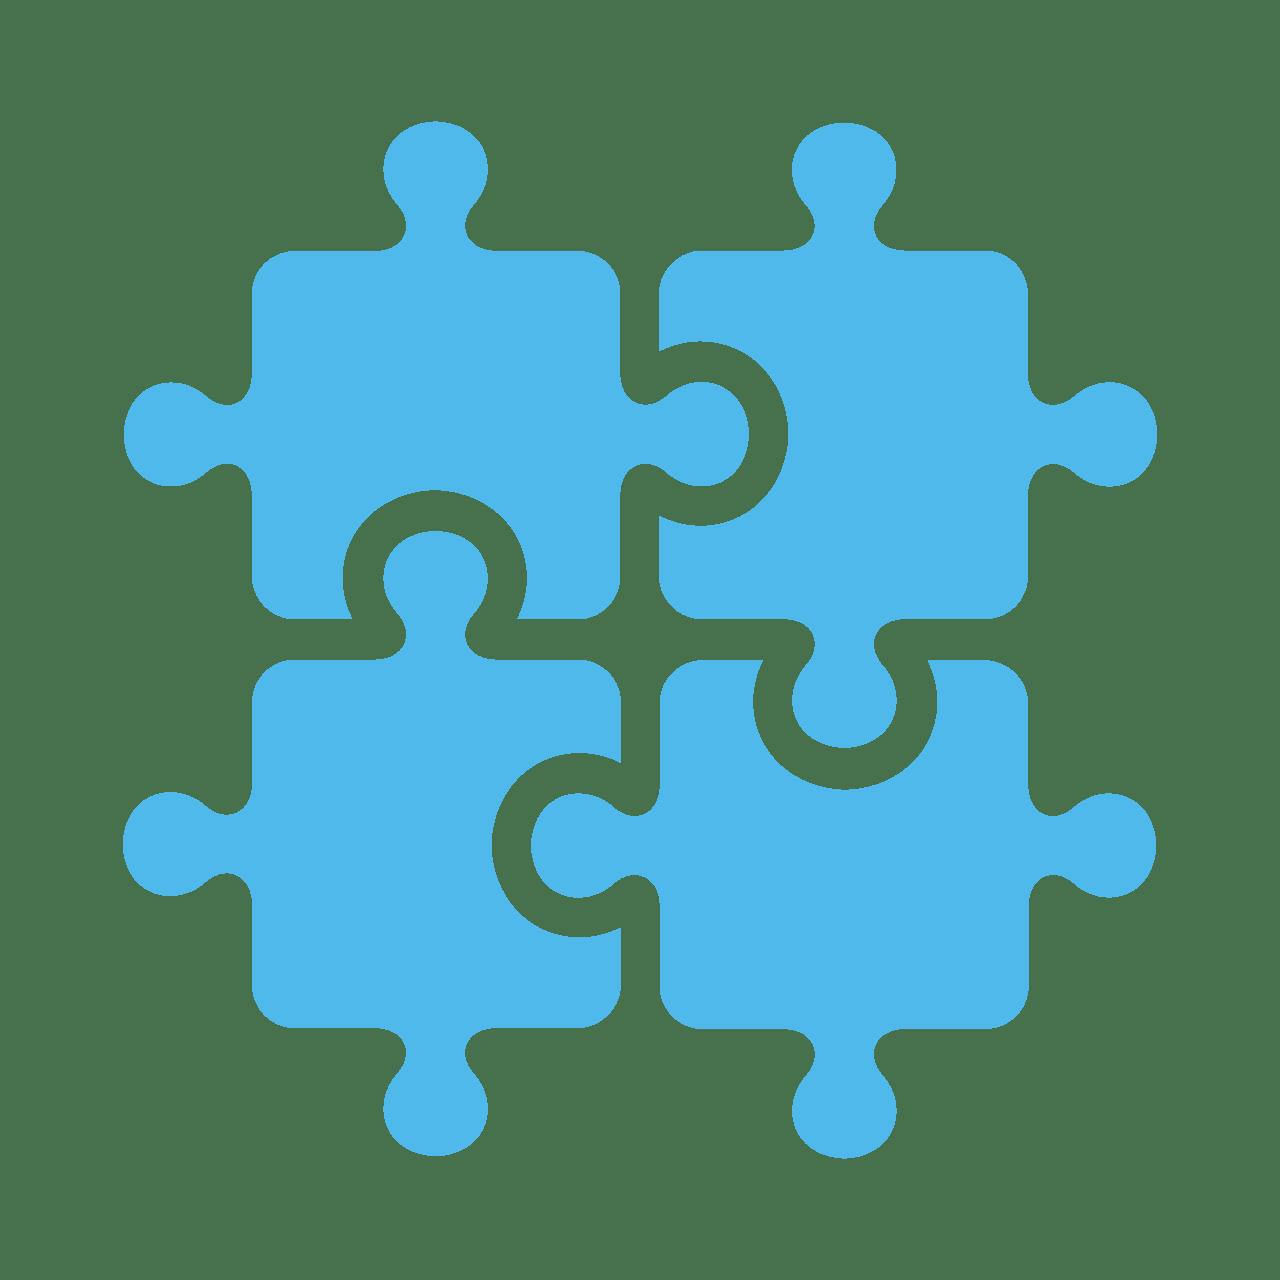 Puzzle Min